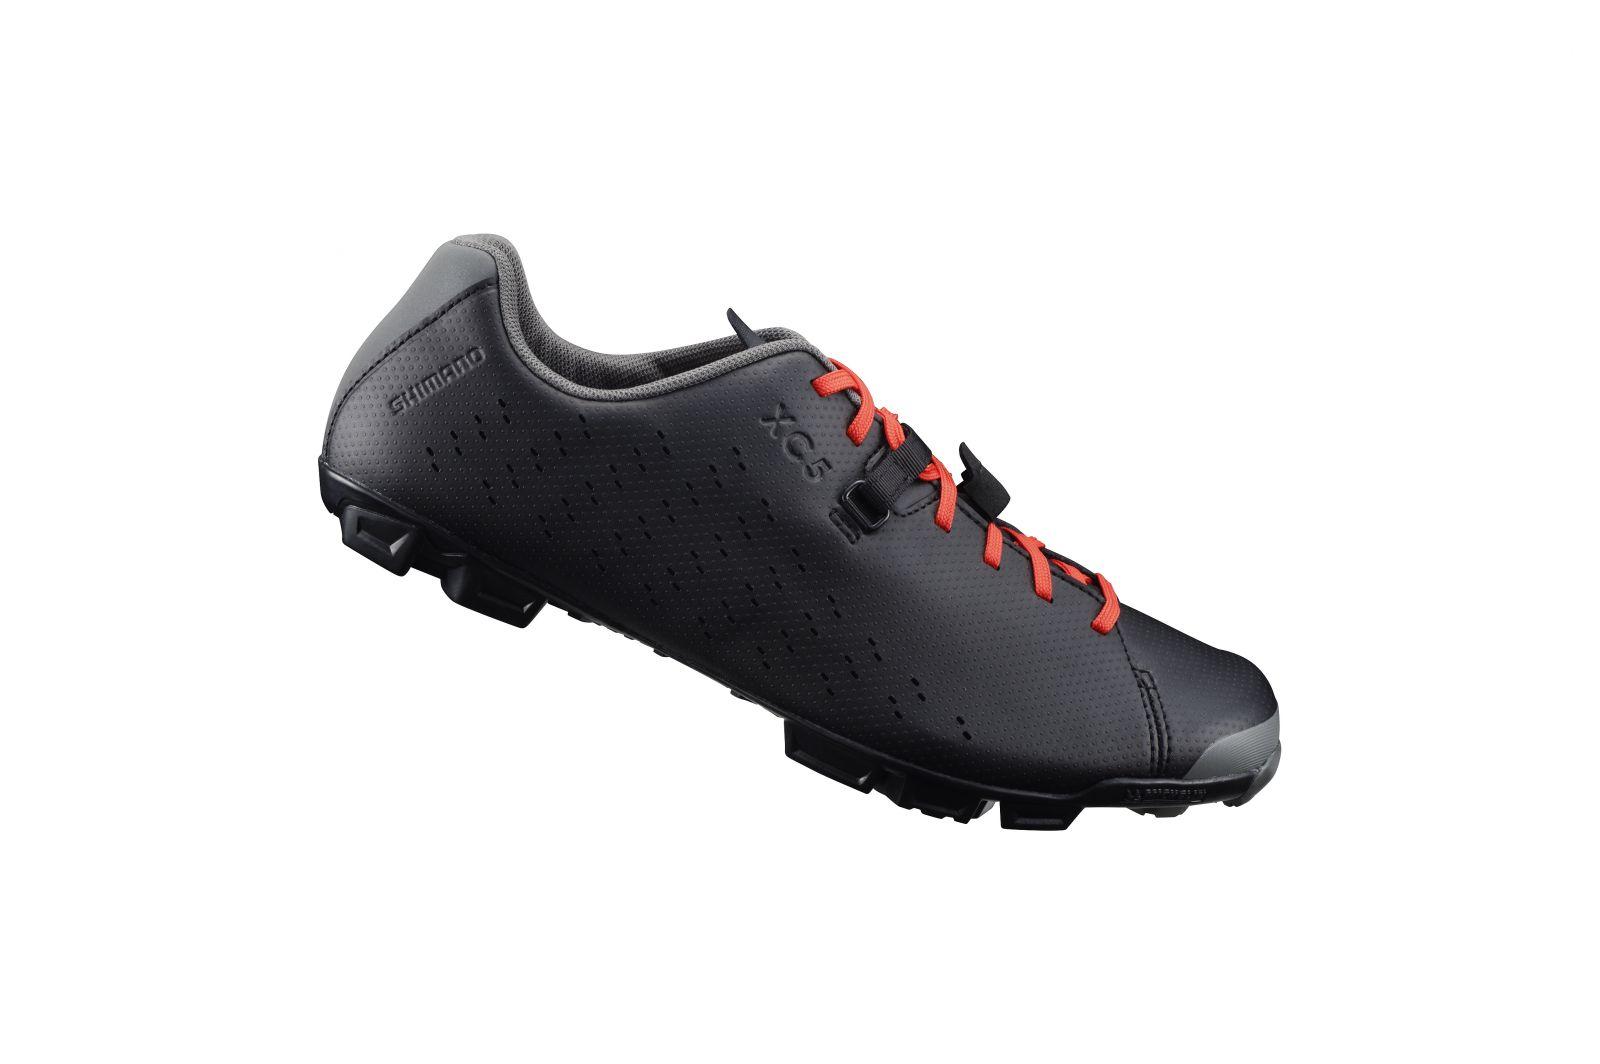 SHIMANO MTB obuv SH-XC500ML, černá, 43